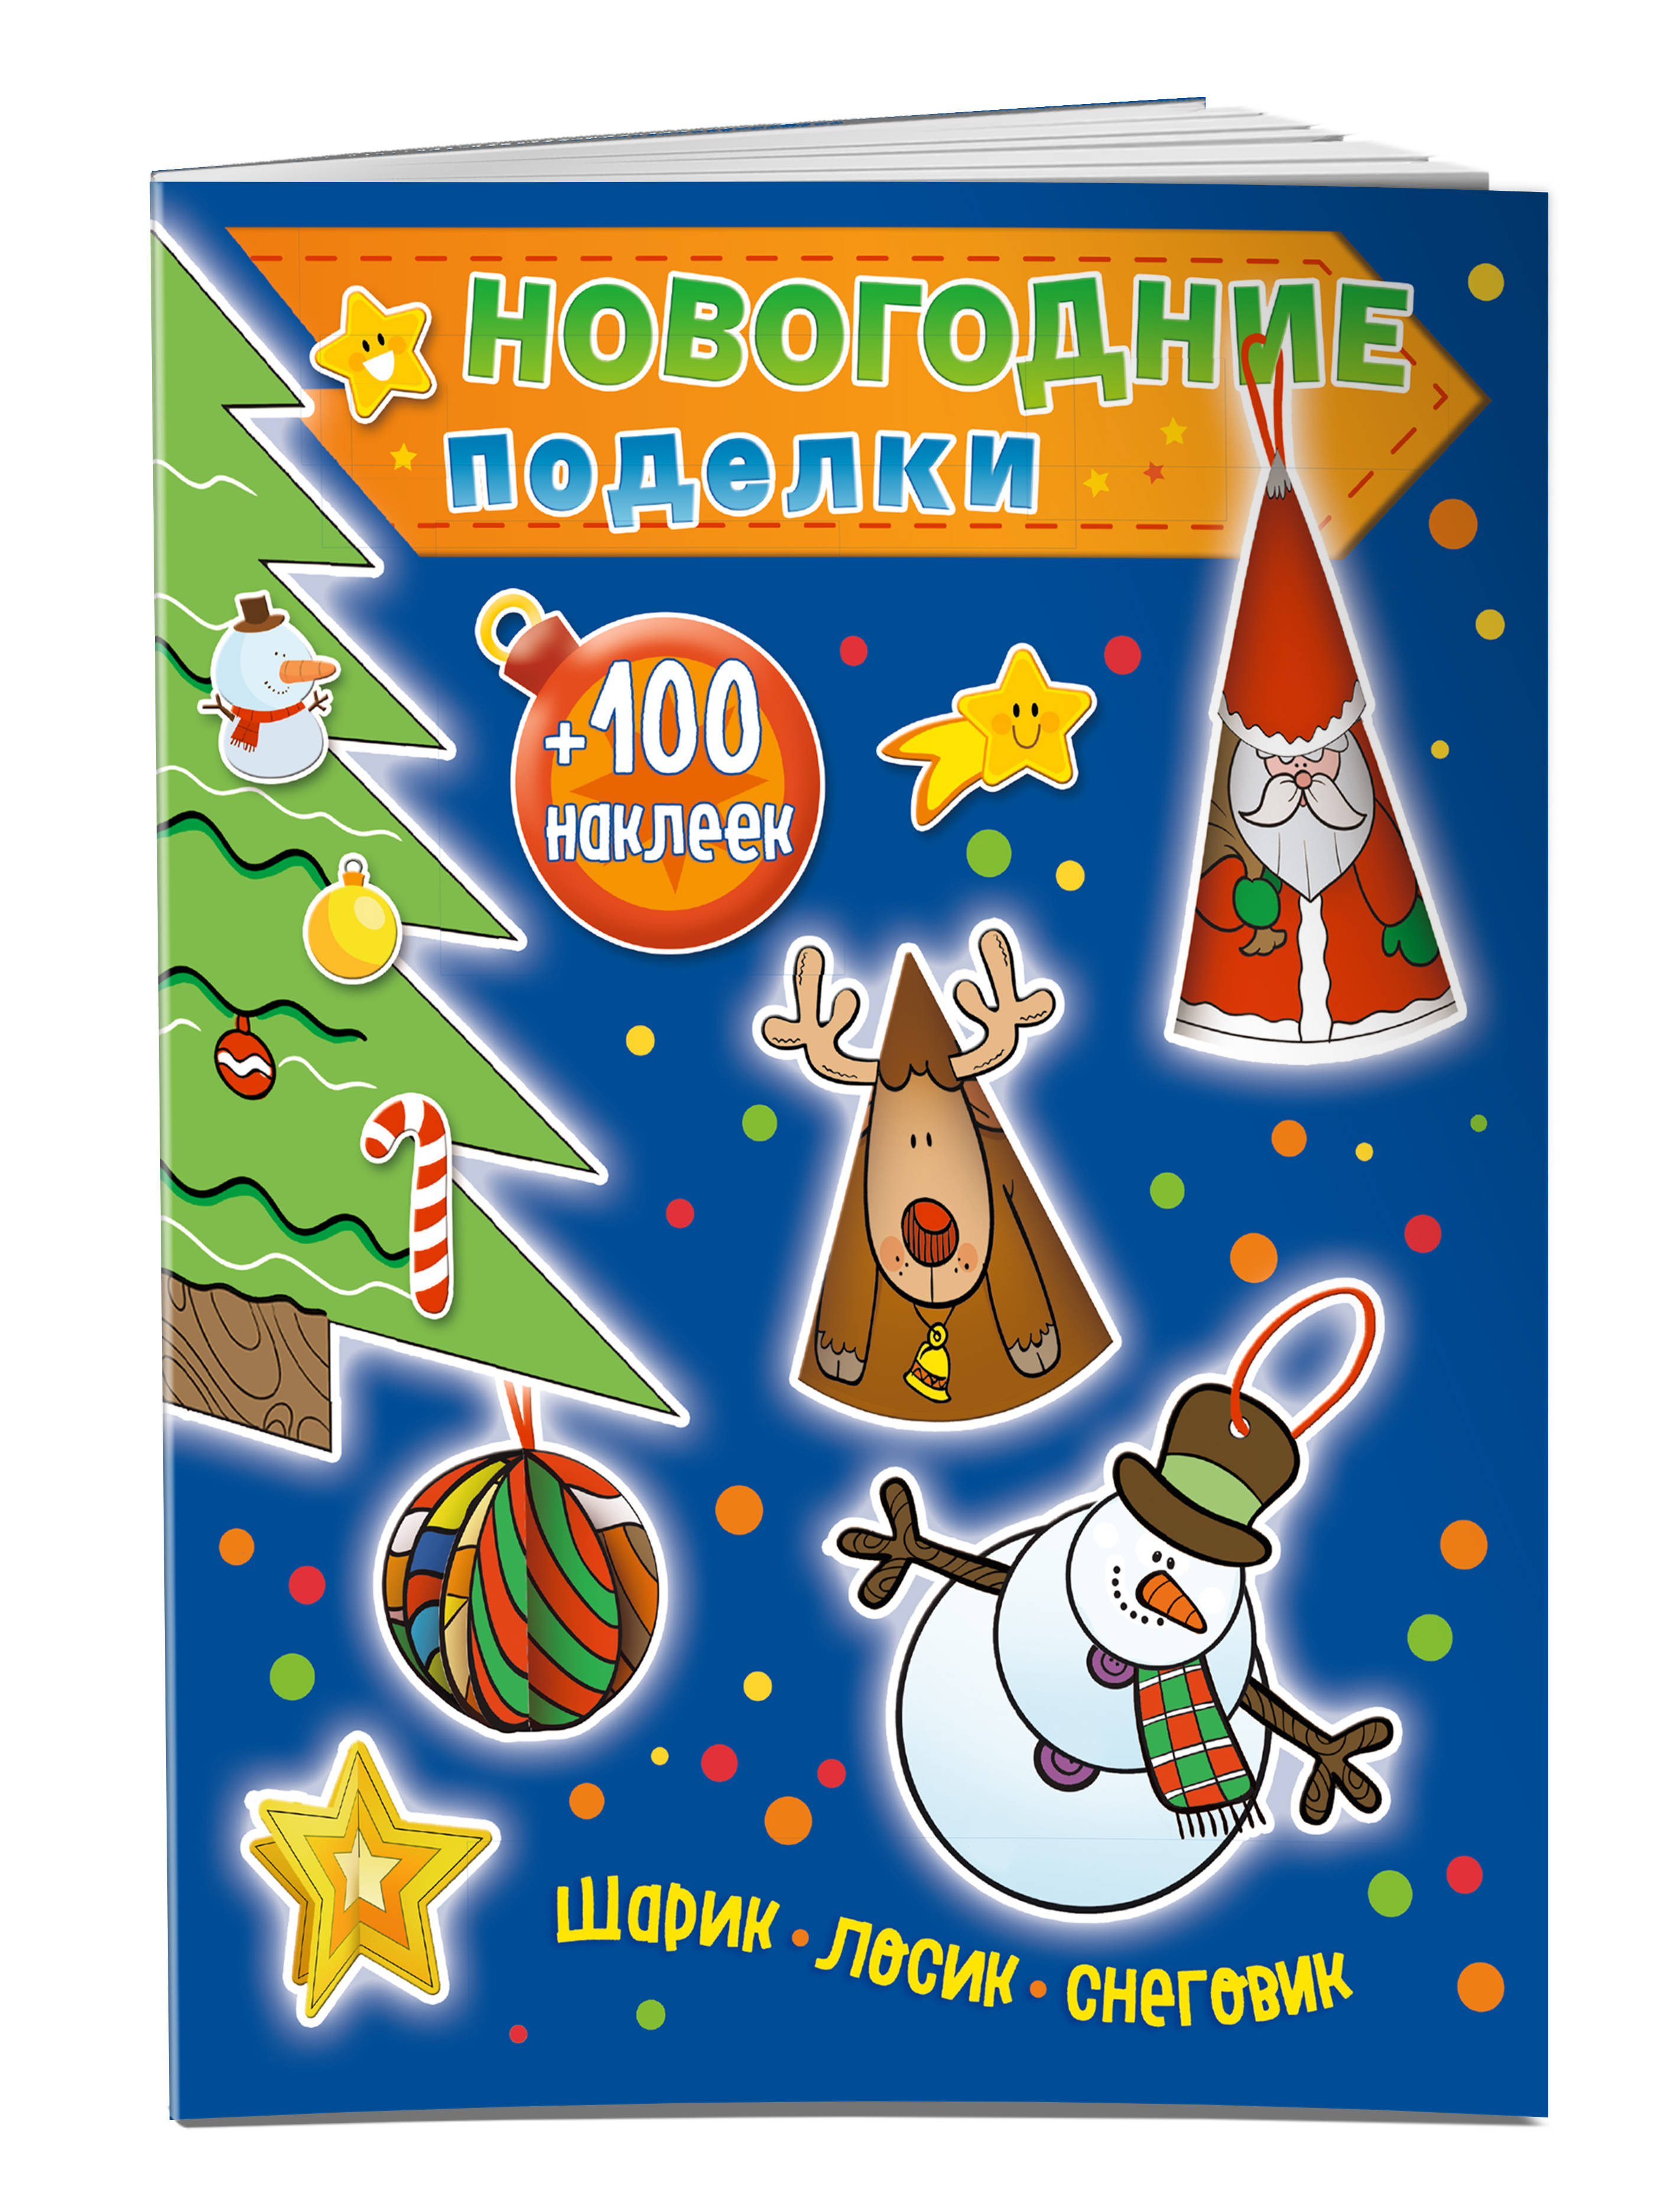 Шарик, лосик, снеговик (+100 наклеек) цена